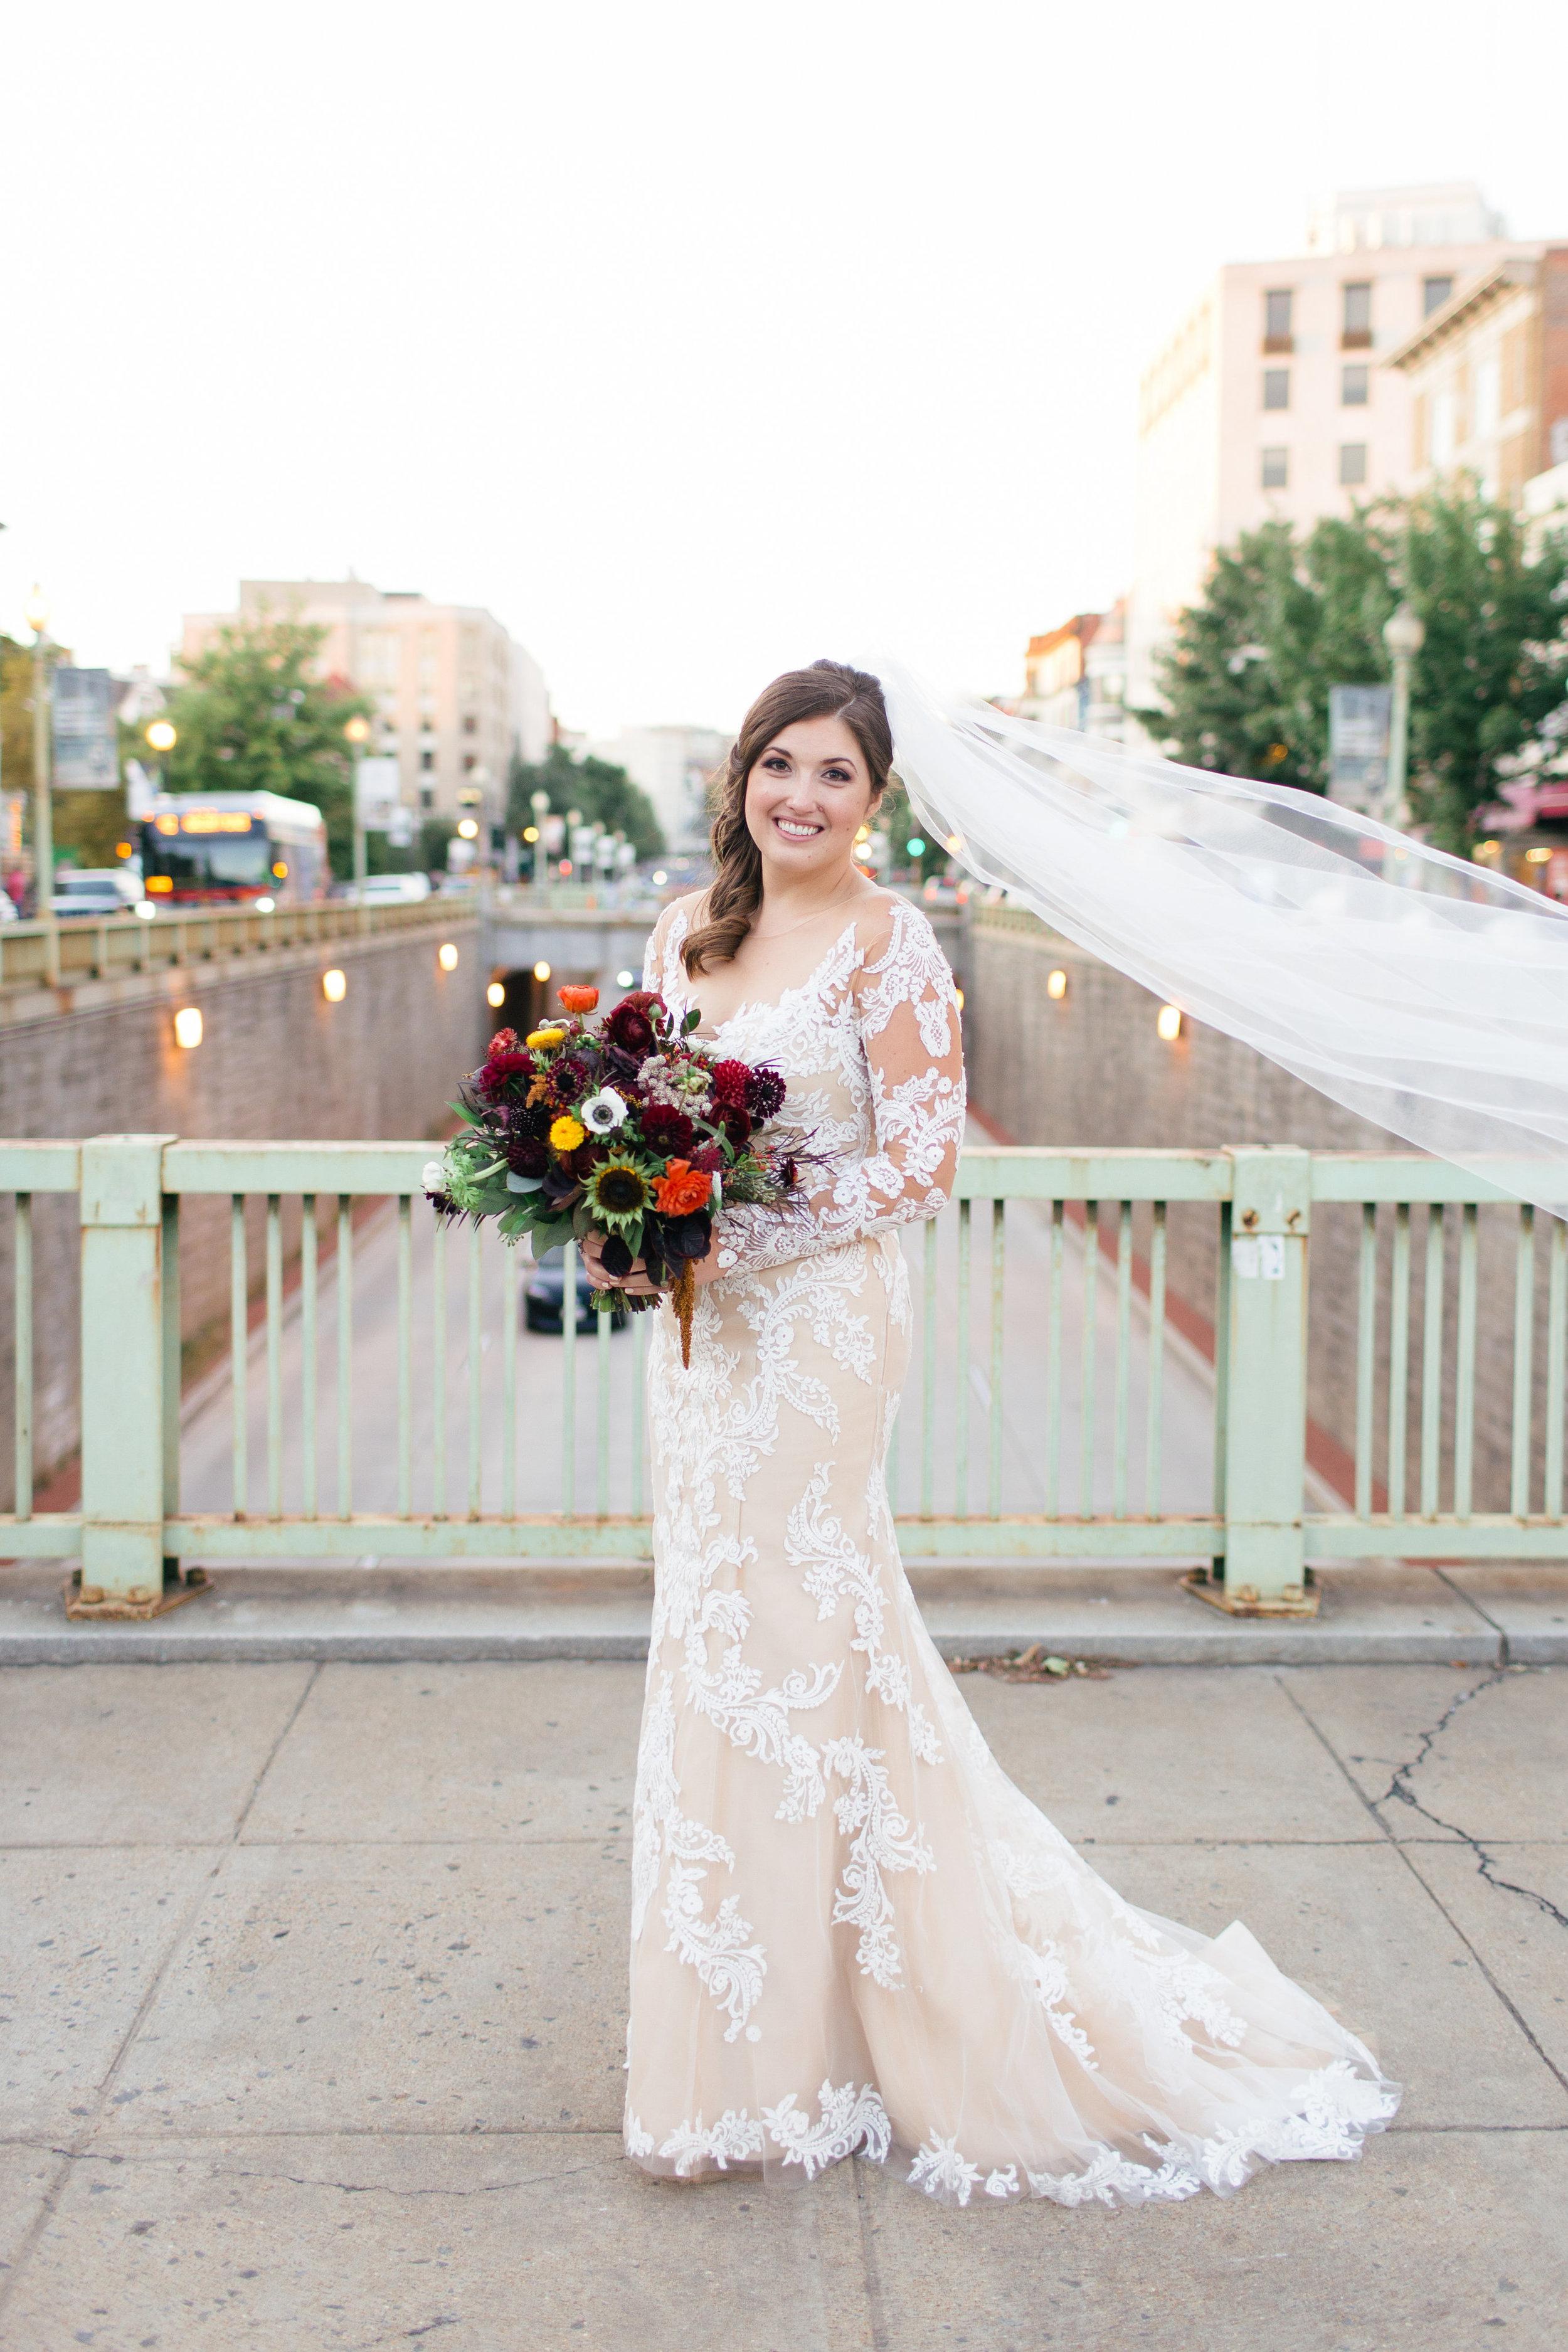 Dupon Circle Wedding | Washington DC Wedding Photography | Rebecca Wilcher Photography -25.jpg